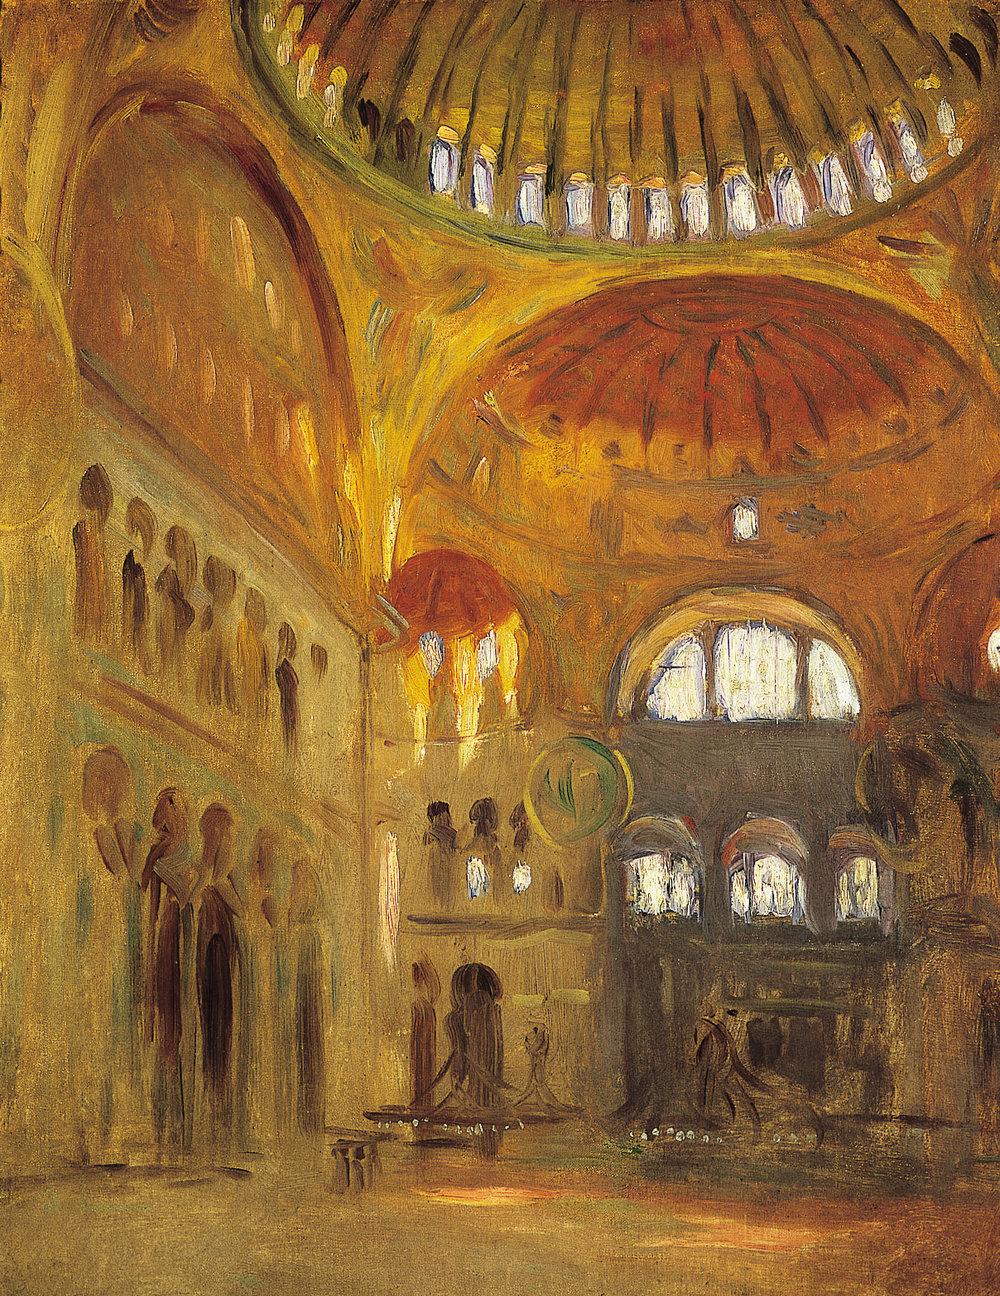 Arte de John Singer Sargent